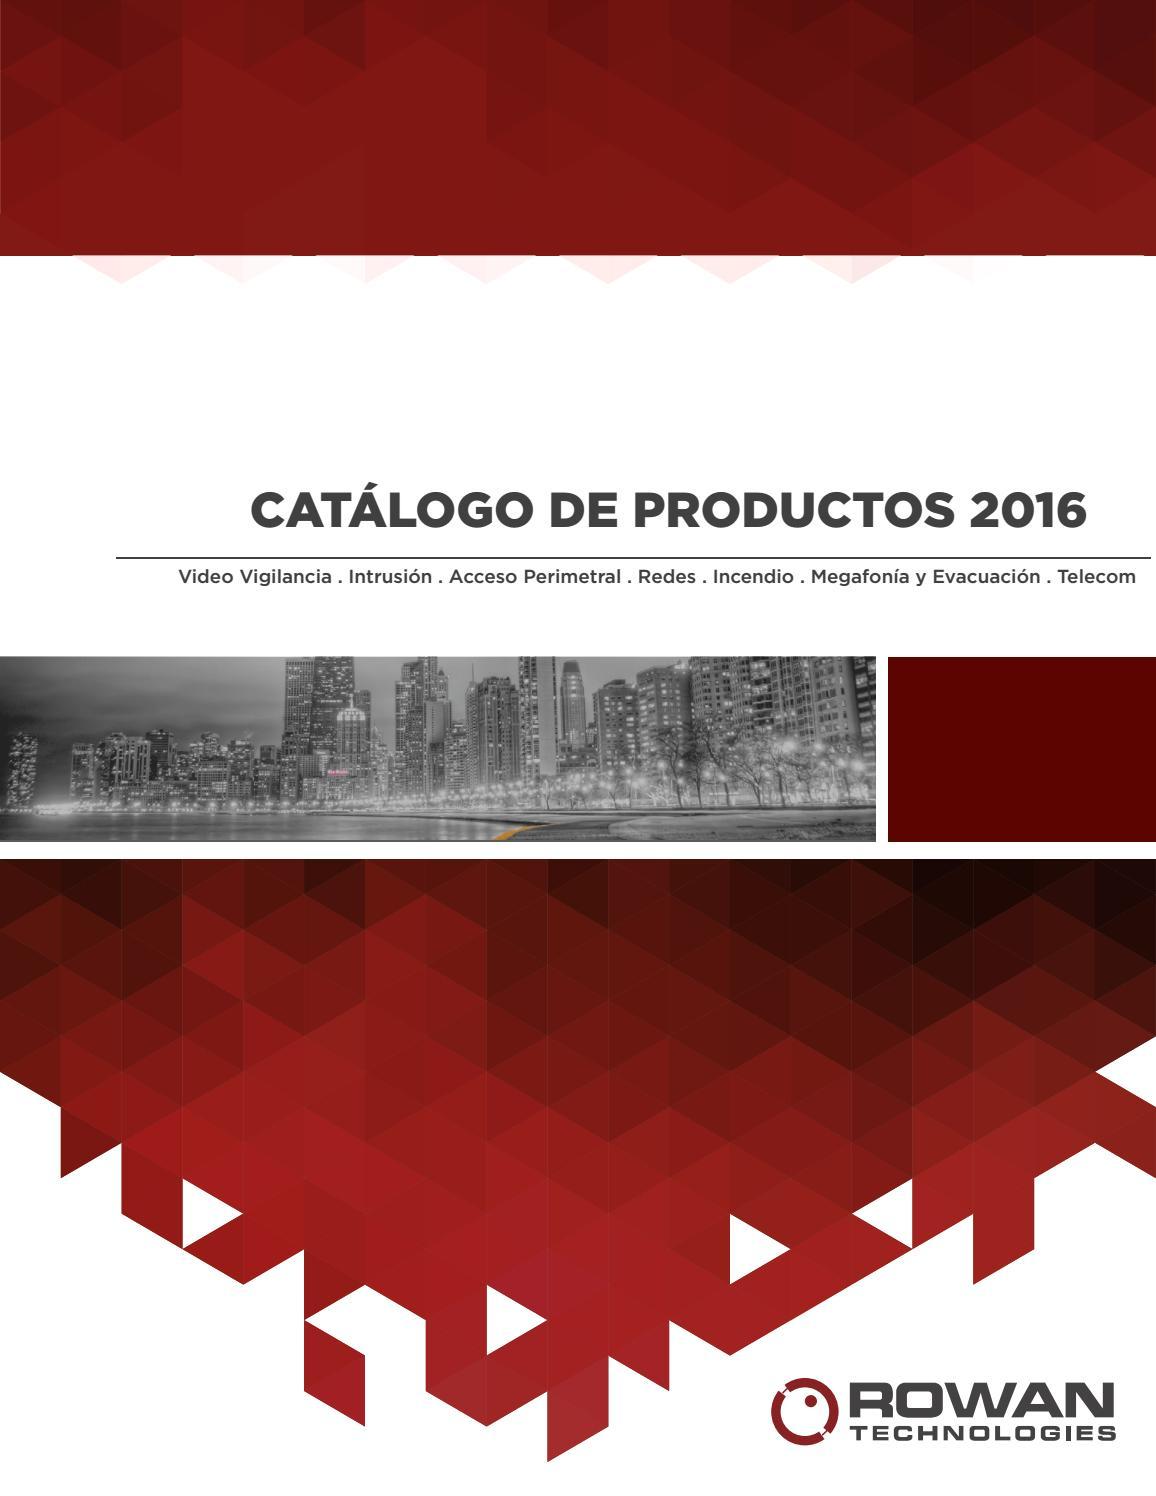 Catálogo General 2016 by RowanTechnologies - issuu